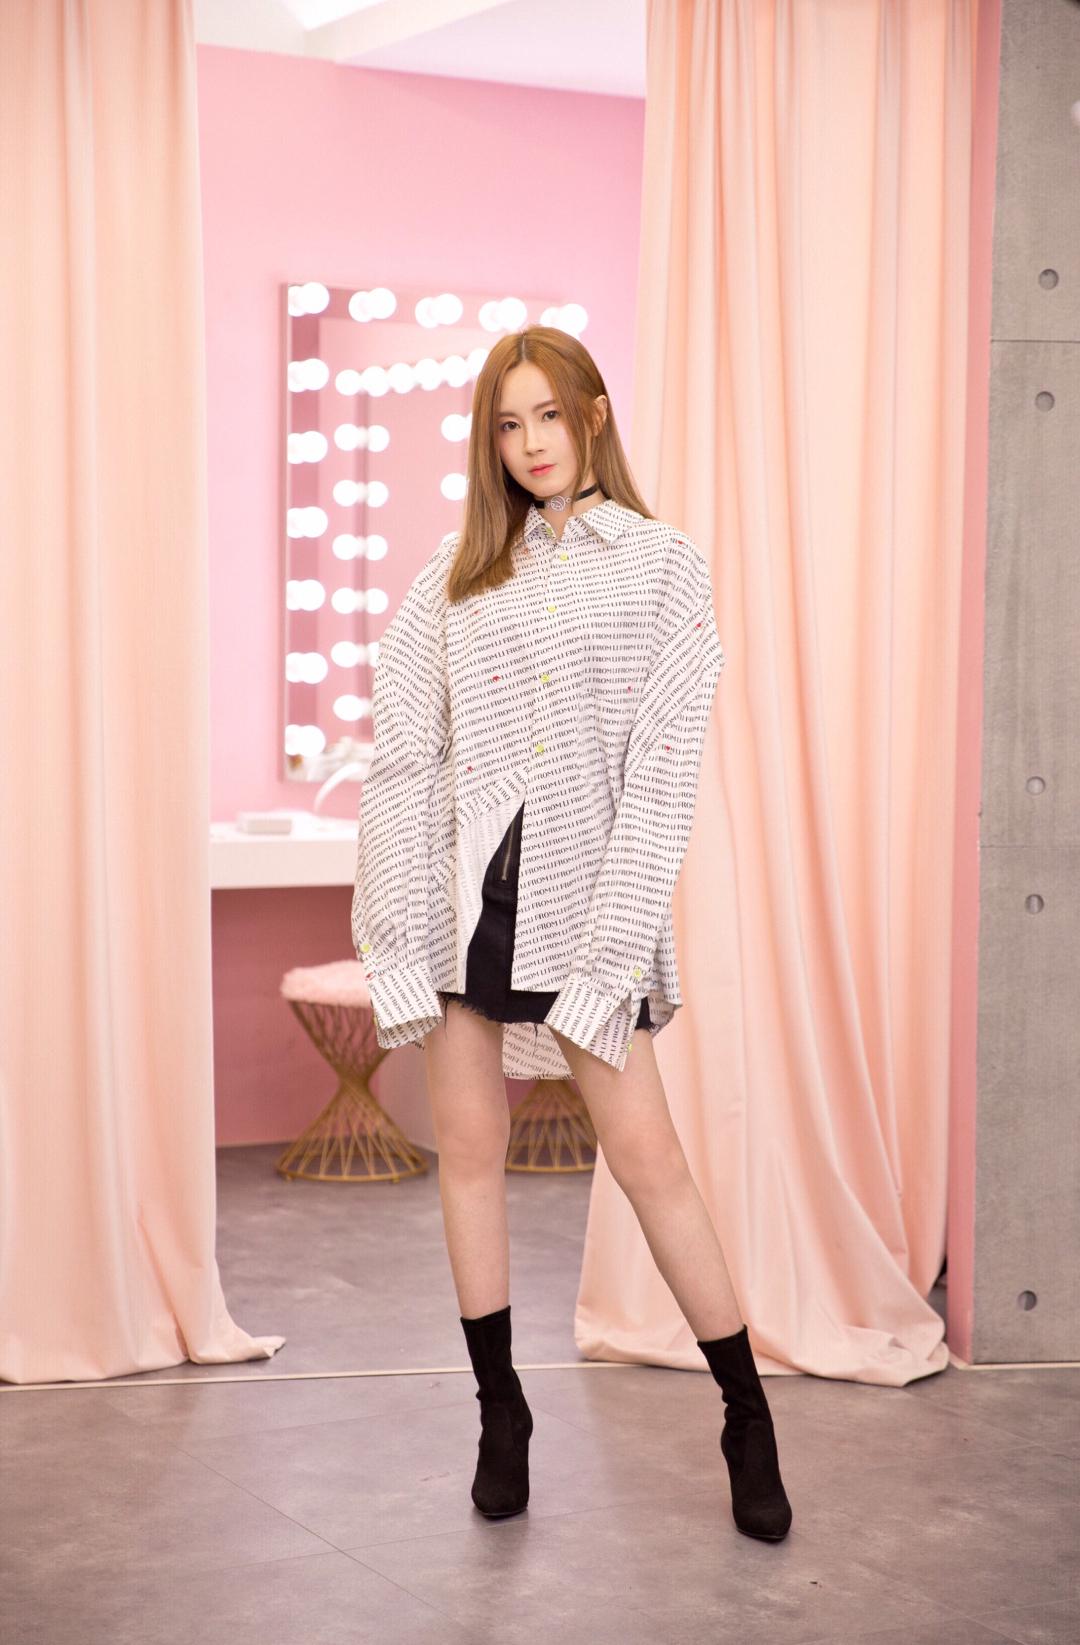 choker: WynHu top: From Li skirt: hits's boot: stuart weitzman  。 。 。 家里最多的上衣是衬衫,真的特別爱穿,有合身的、oversize的、有不同颜色和材质的。喜欢衬衫的最主要的原因是— 特别能显质感,适合用于各种不同场合,而且非常百搭。😁 一件cutting别致的oversize衬衫, 又称BF shirt,配搭短裙,choker和靴子,帅帅的,酷酷的,秋冬天配上毛织背心,顿时有种校园风,甜美的感觉。SW的靴子依然是大家的宠儿,果然既好看又好穿,我买的这双是cling~😛✨ #MOGU  Studio# @moguatudio